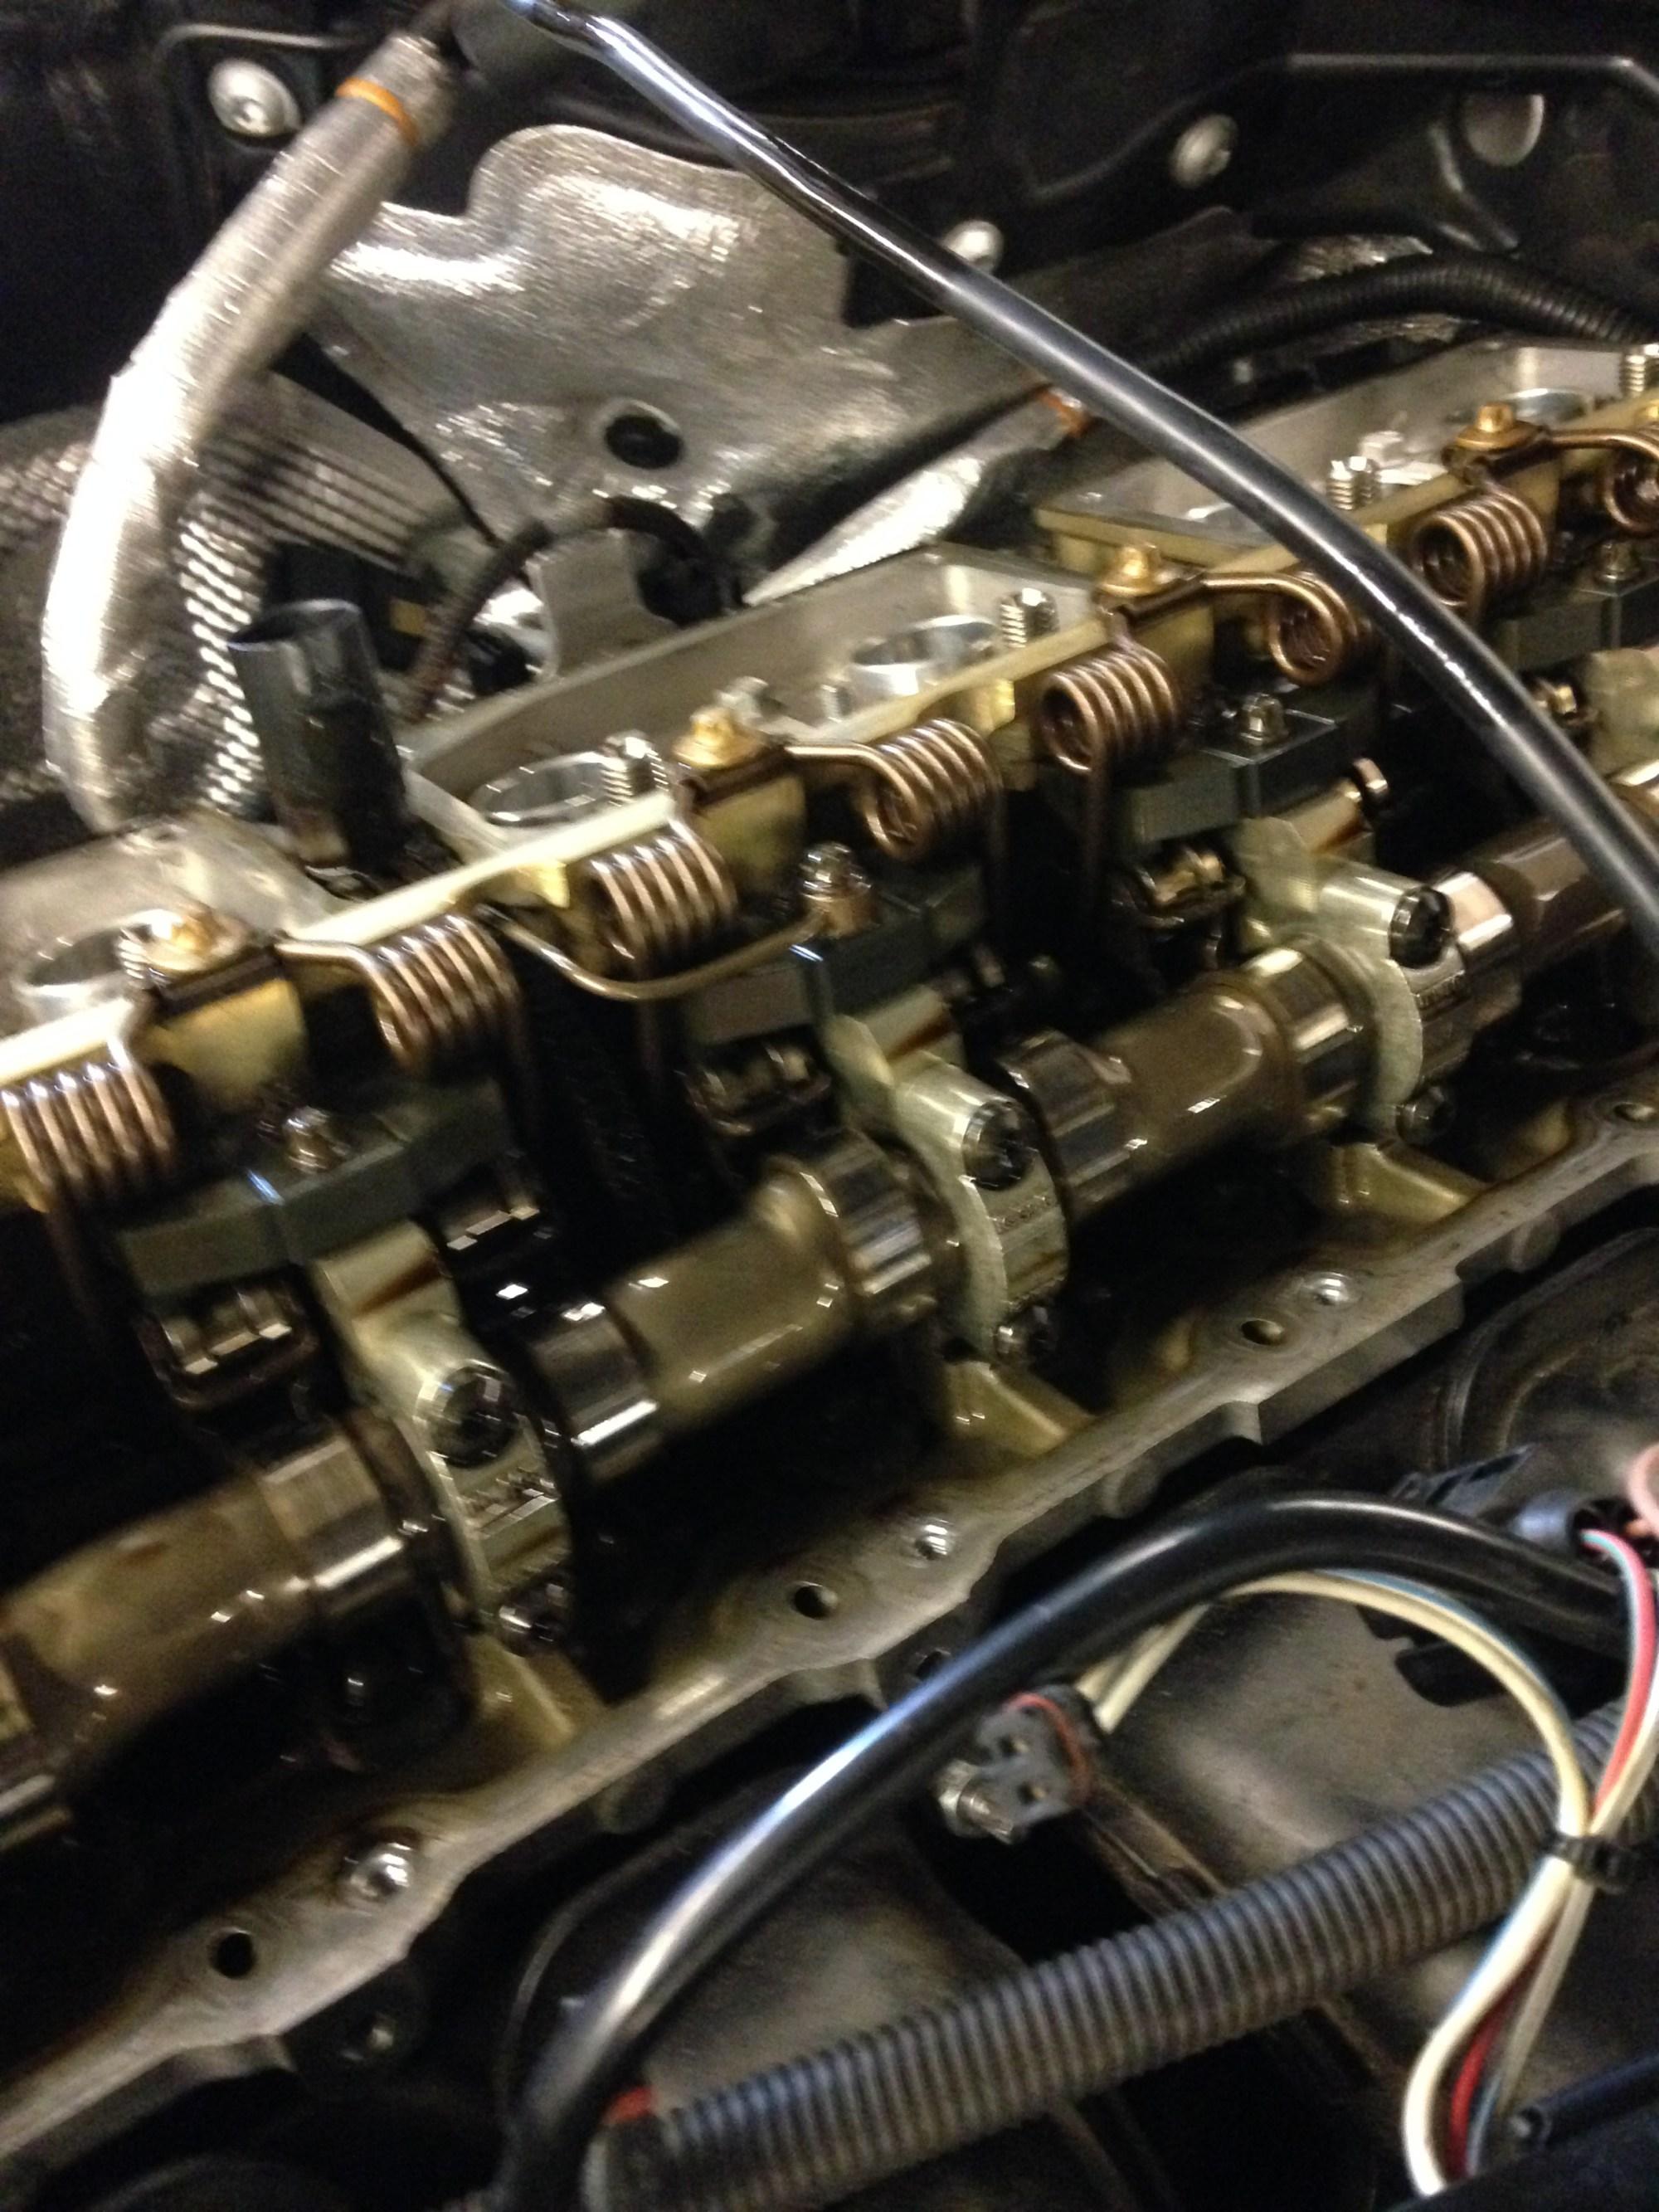 hight resolution of n55 eccentric shaft valvetronic motor bmwtechnician 2007 bmw wiring diagram motor wiring diagram bmw e90 eccentric